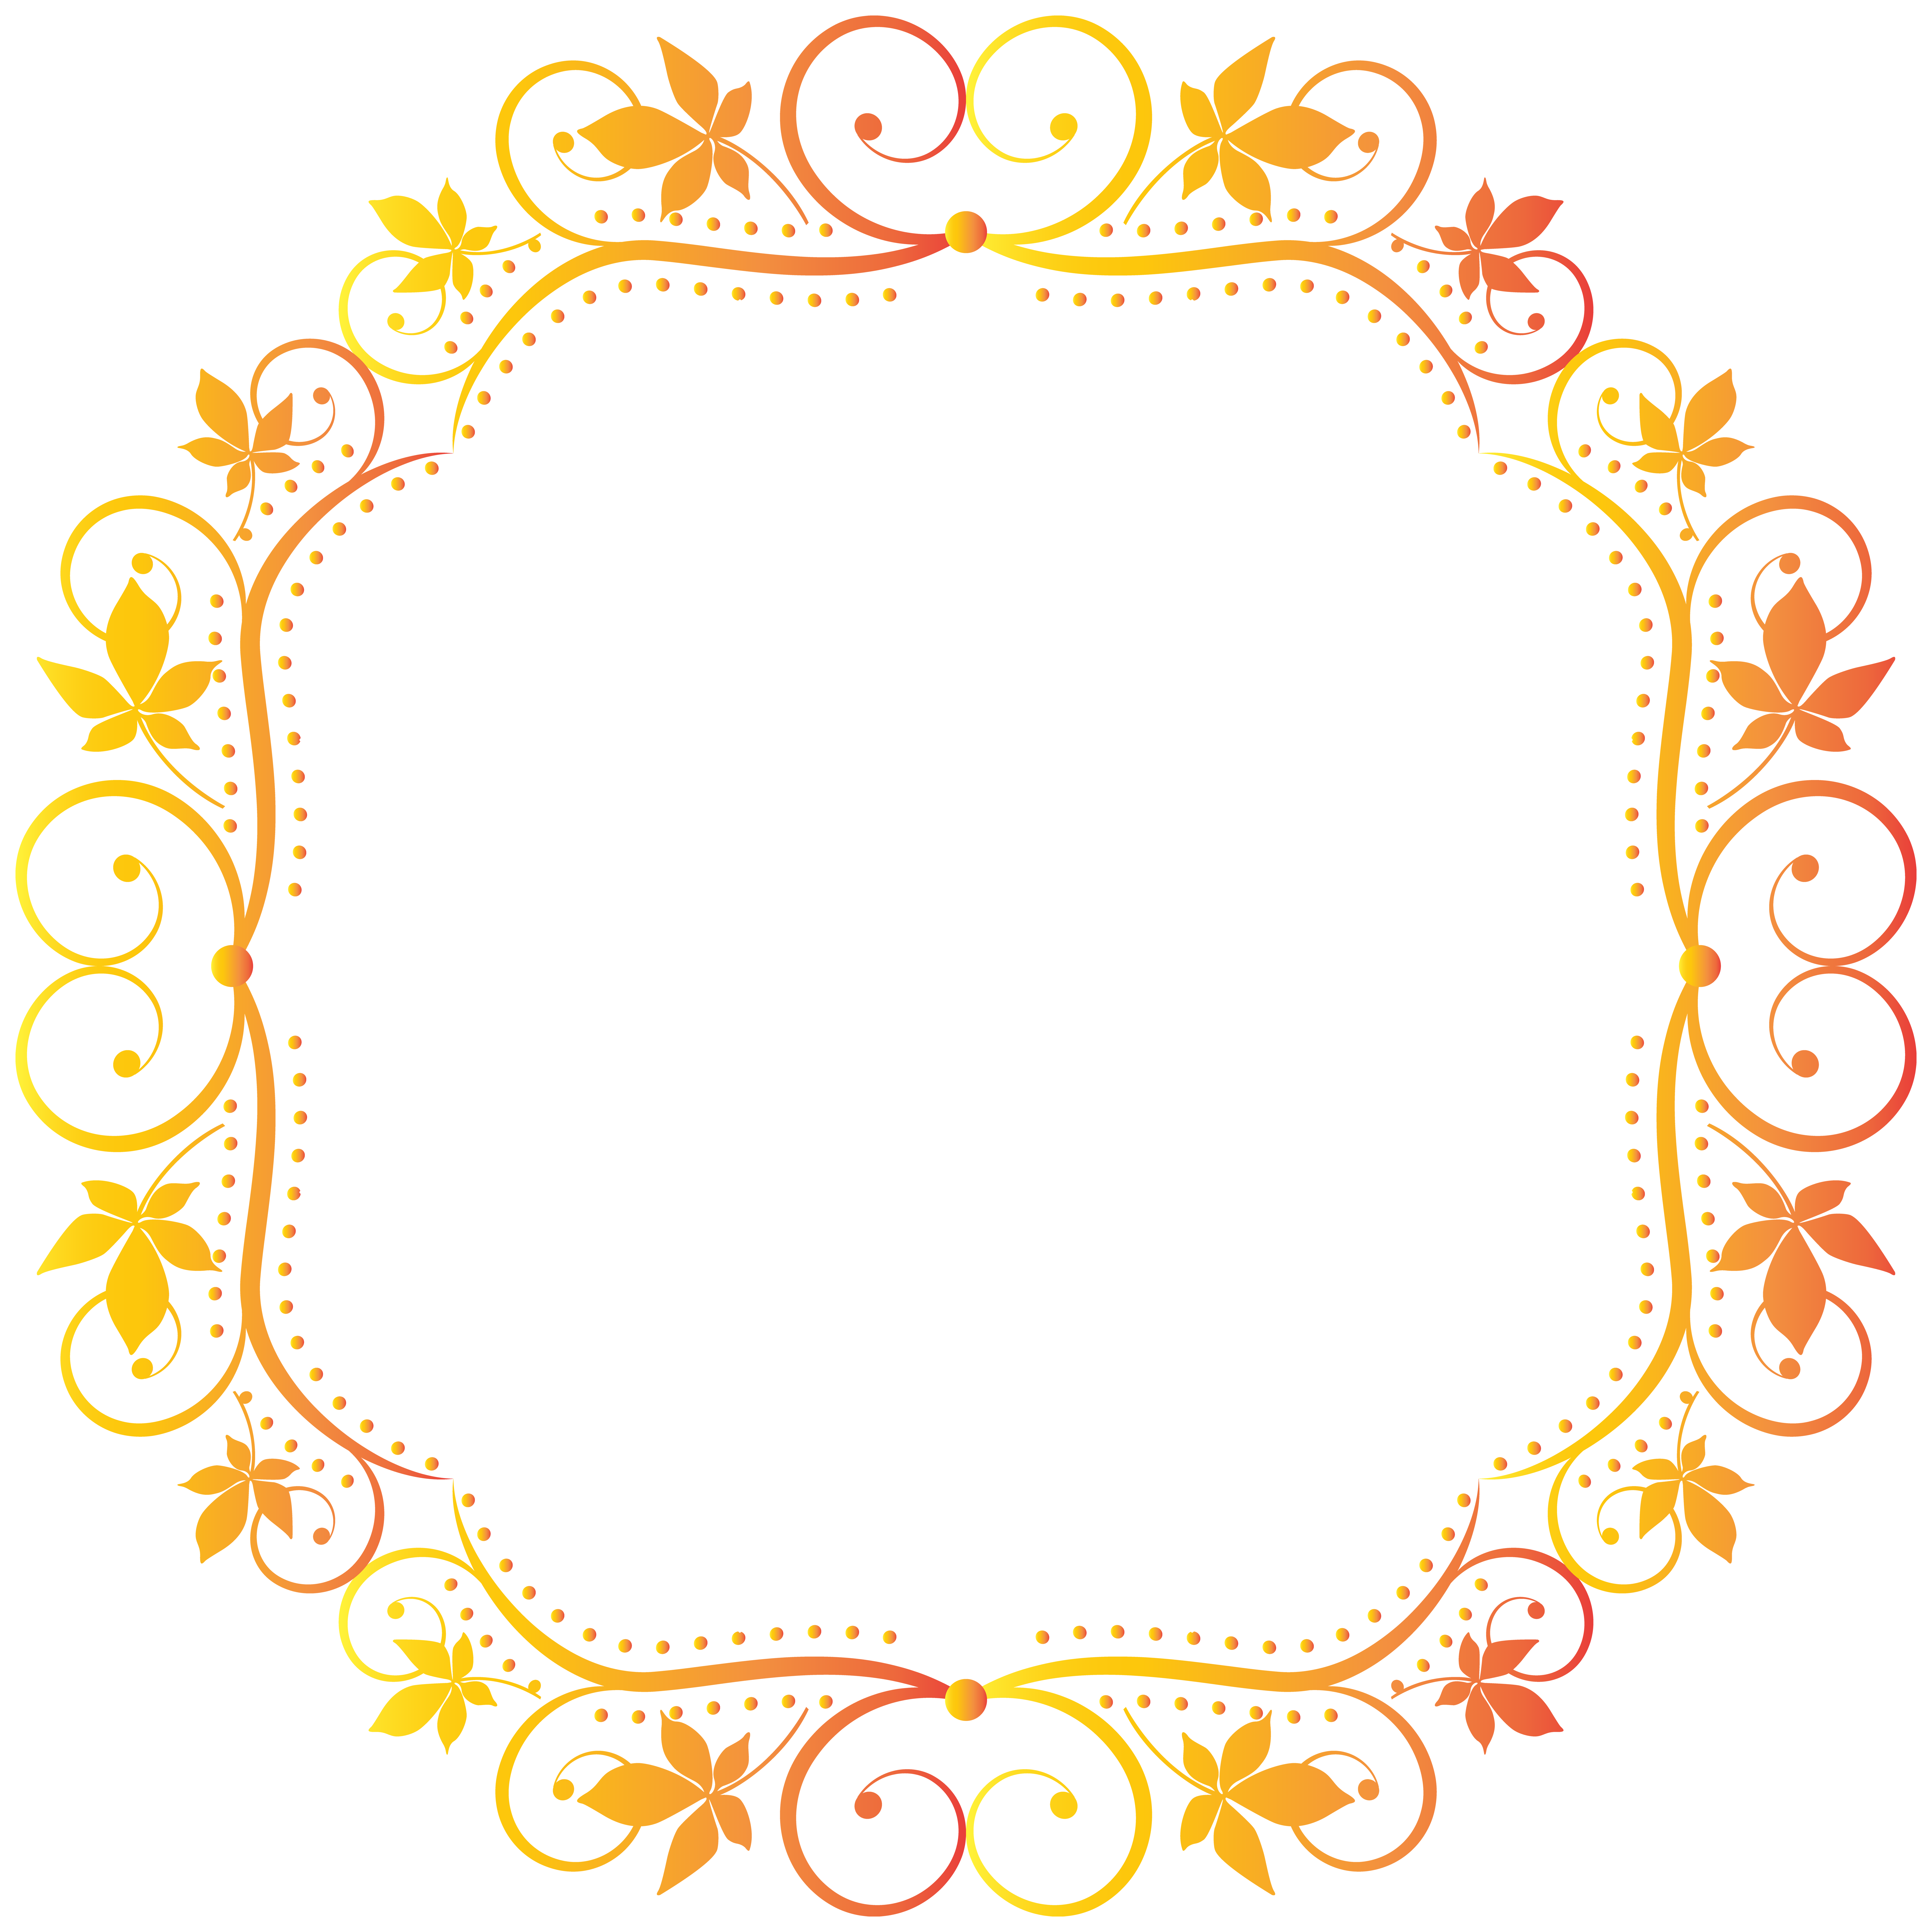 Frame transparent clip art. Fall border png